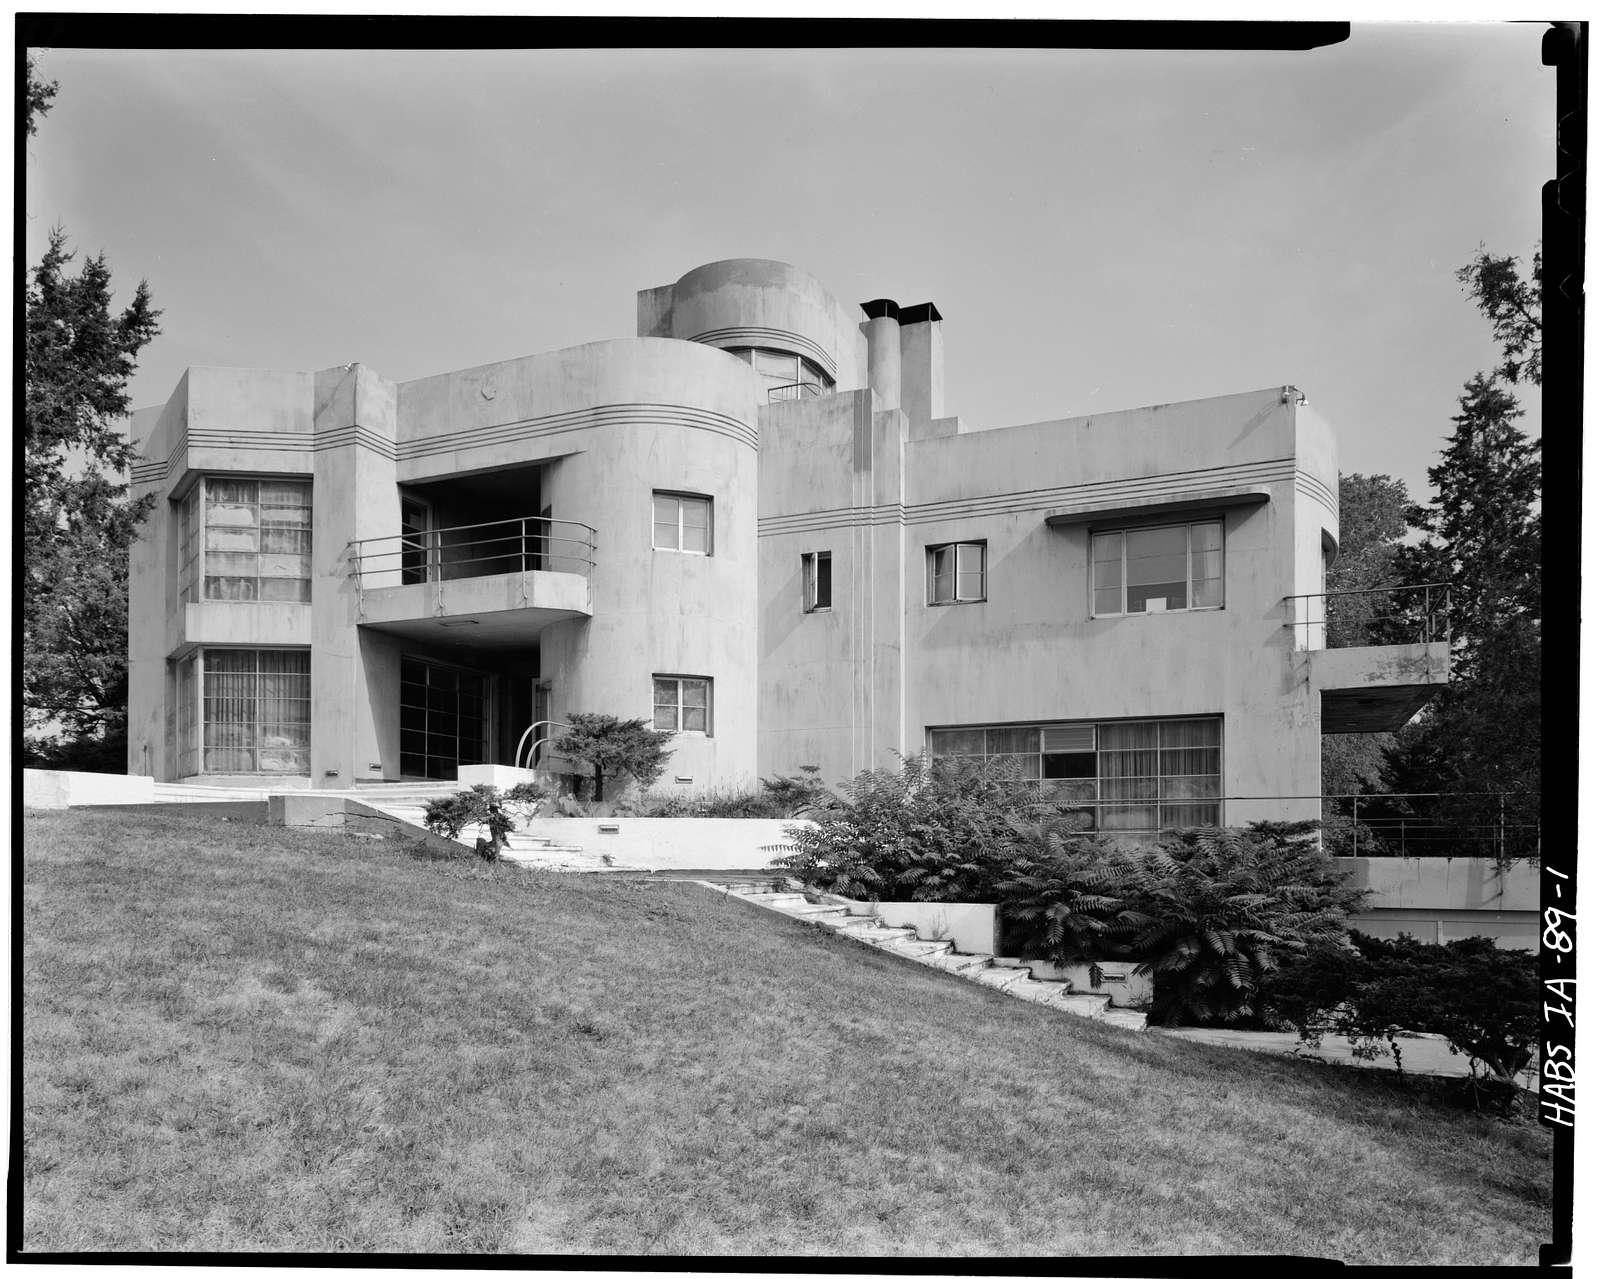 Earl Butler House, 2633 South Fluer Drive, Des Moines, Polk County, IA